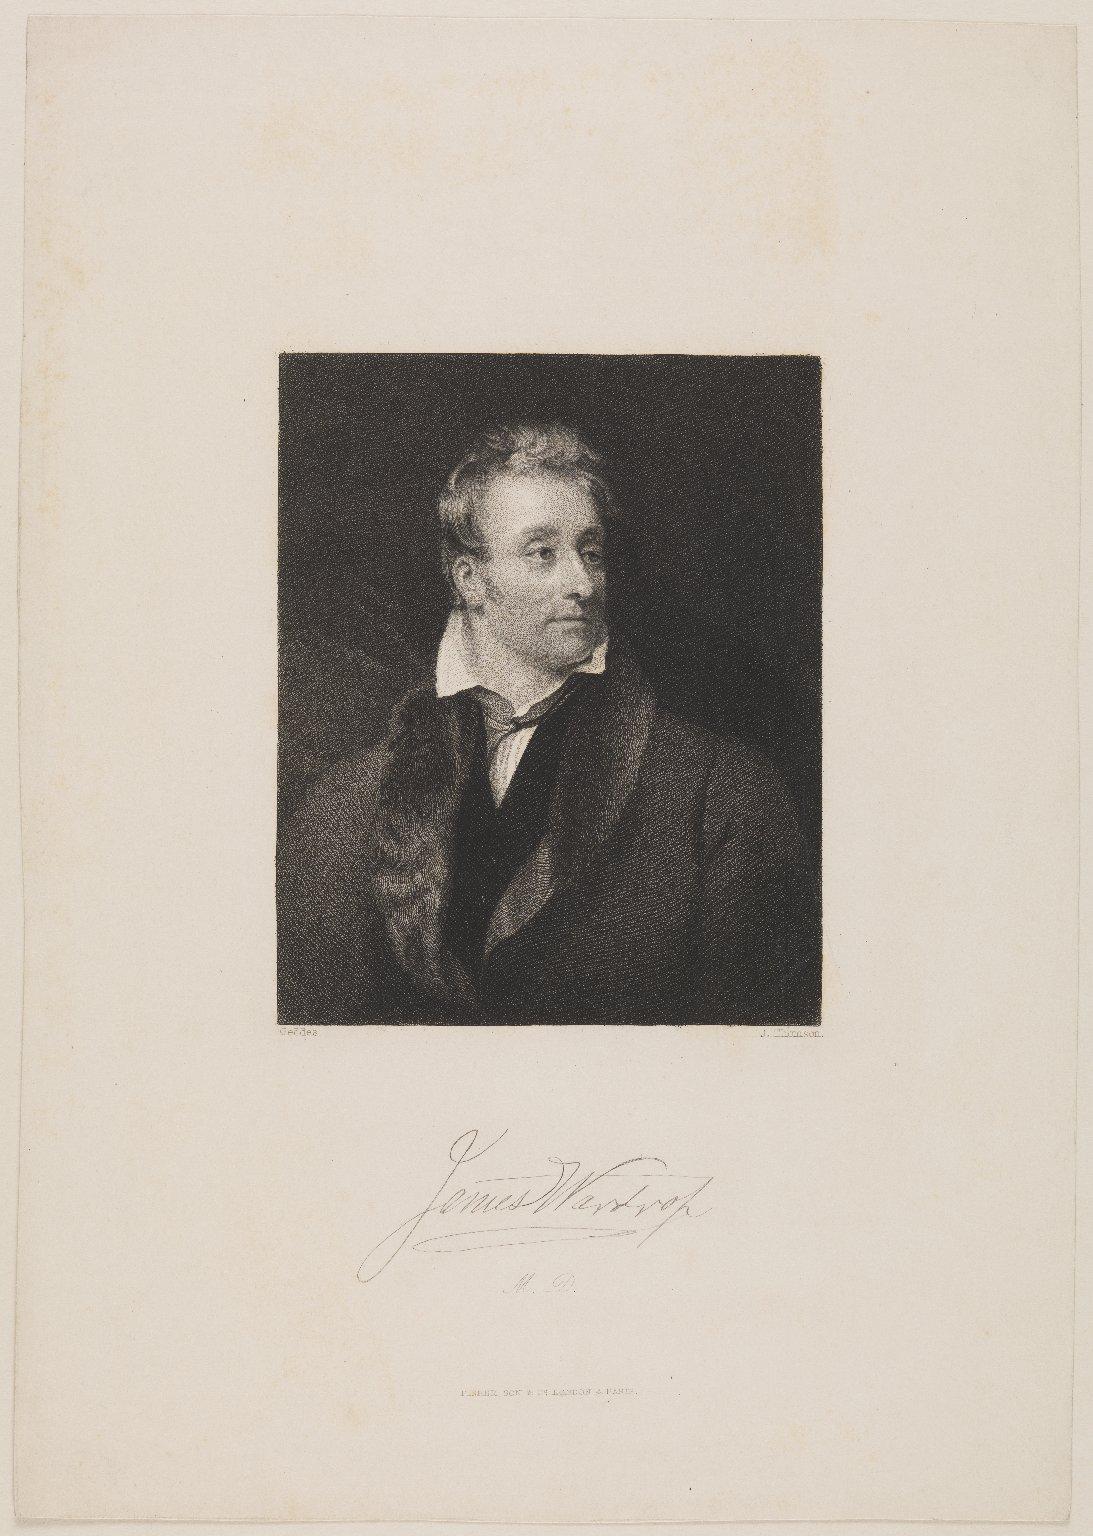 James Wardrop (1782-1869), M.D. St Andrew's, F.R.C.S. London and Edinburgh; Surgeon to George IV